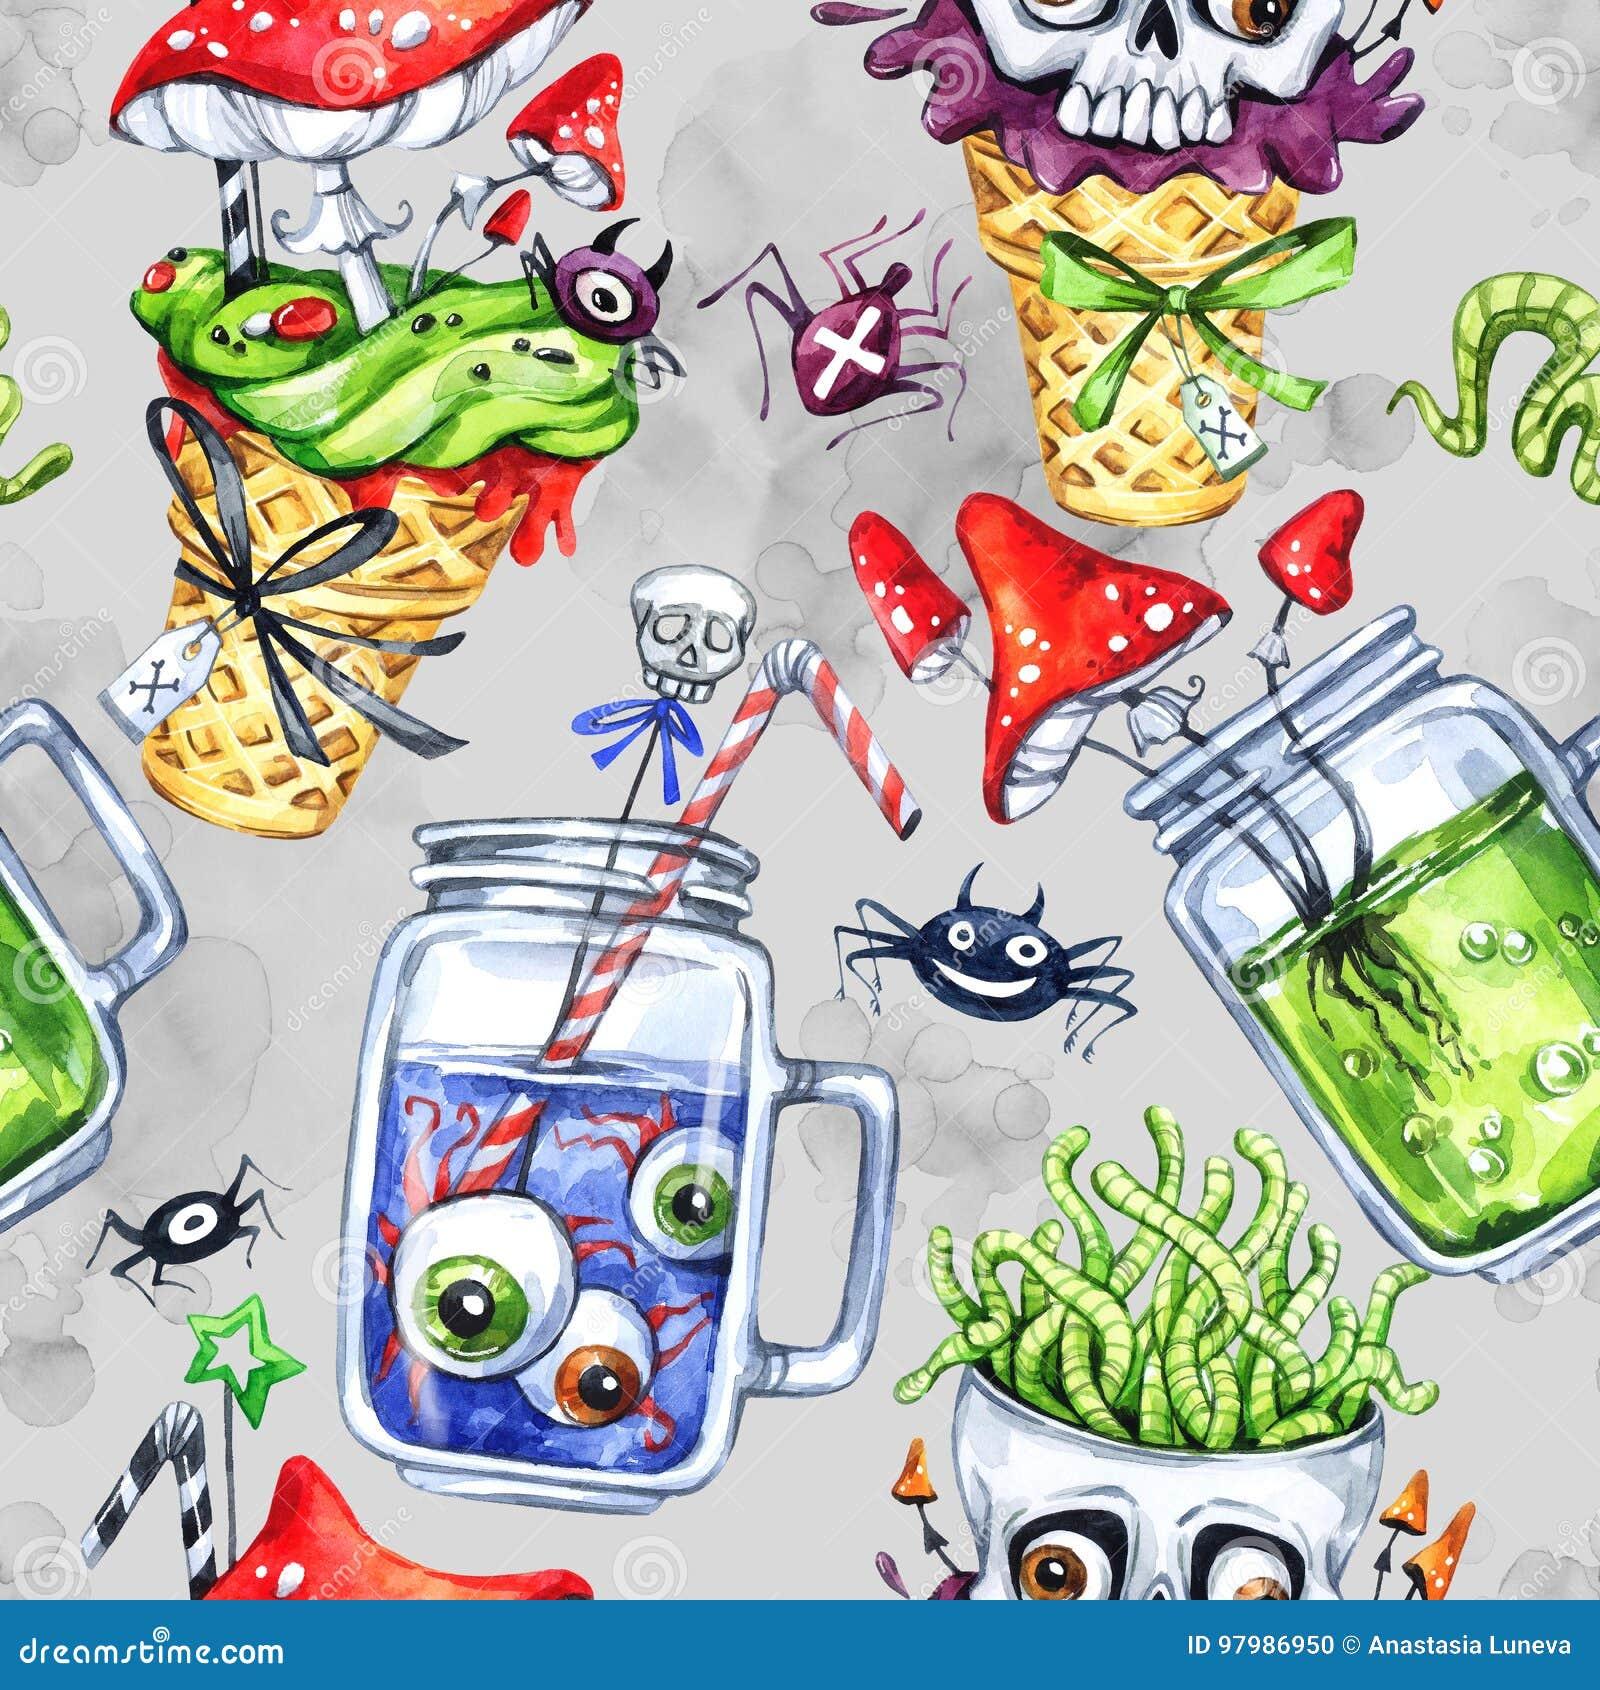 Nahtloses Muster des Aquarells, Kegel mit dem Schädel, Glasschalen mit Trank, Augen, Wulstlinge Halloween-Feiertagsillustration